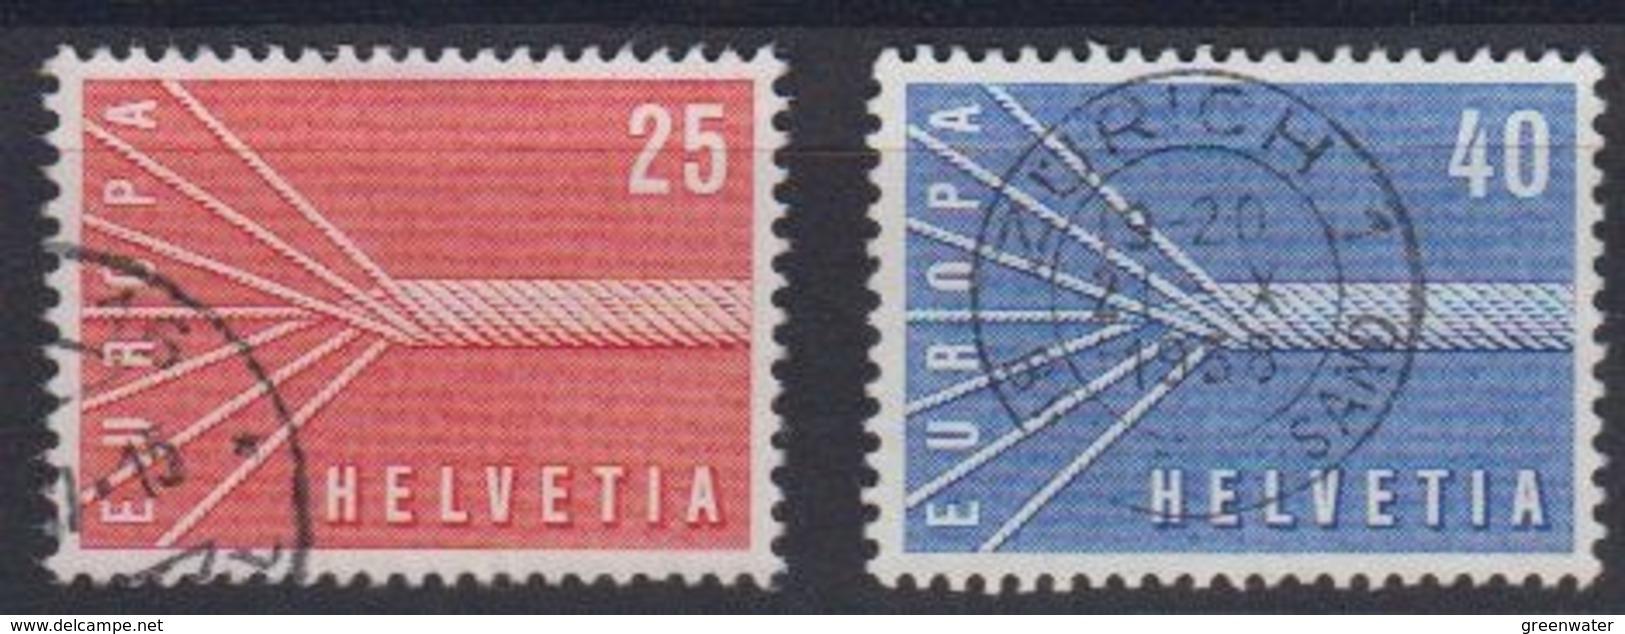 Europa Cept 1957 Switzerland 2v Used (44625B) - Europa-CEPT